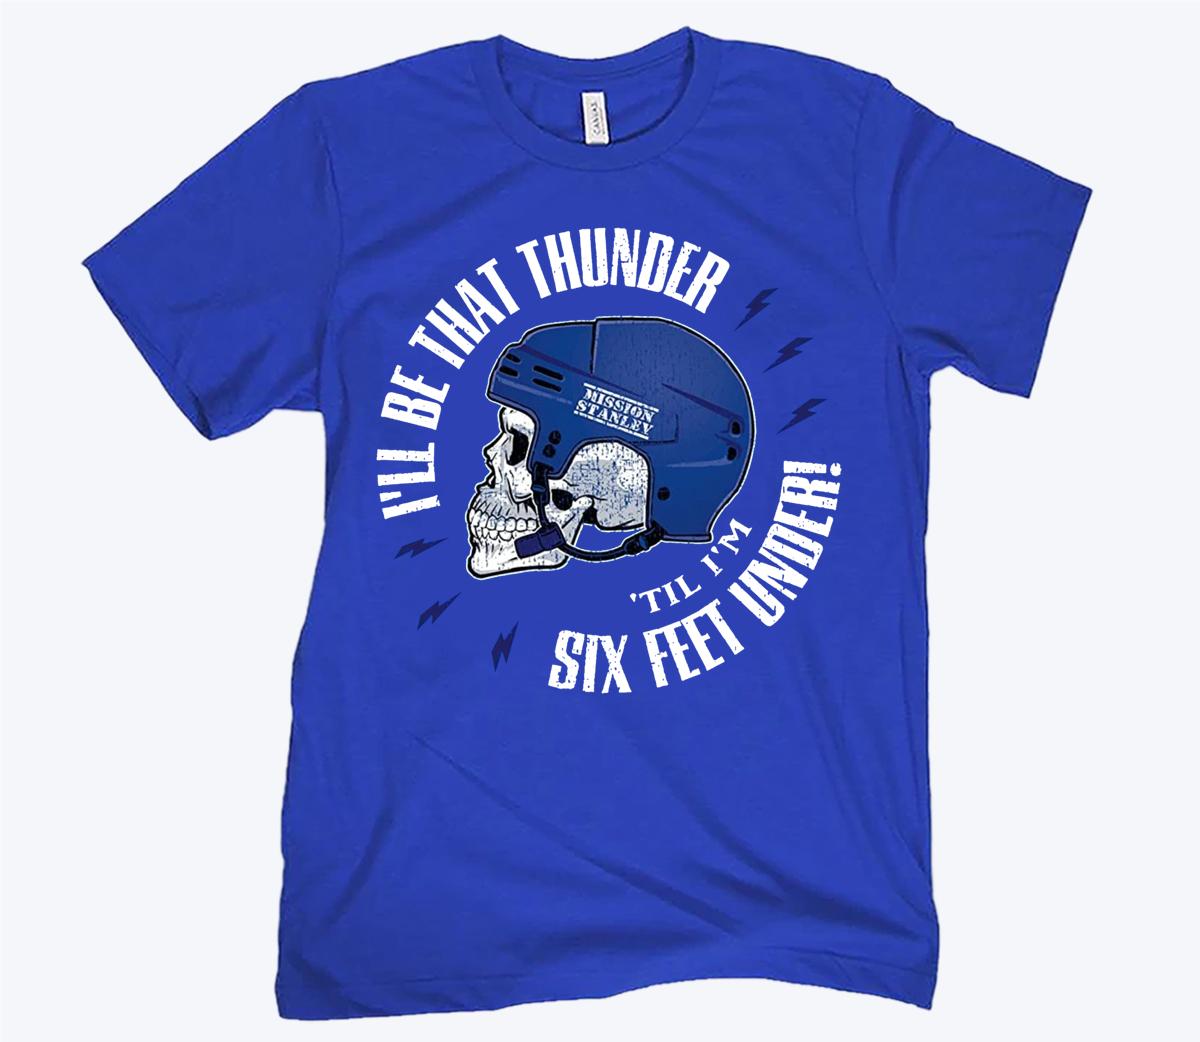 I'll Be That Thunder 'Till I'm Six Feet Under Tampa Bay Hockey T-Shirt